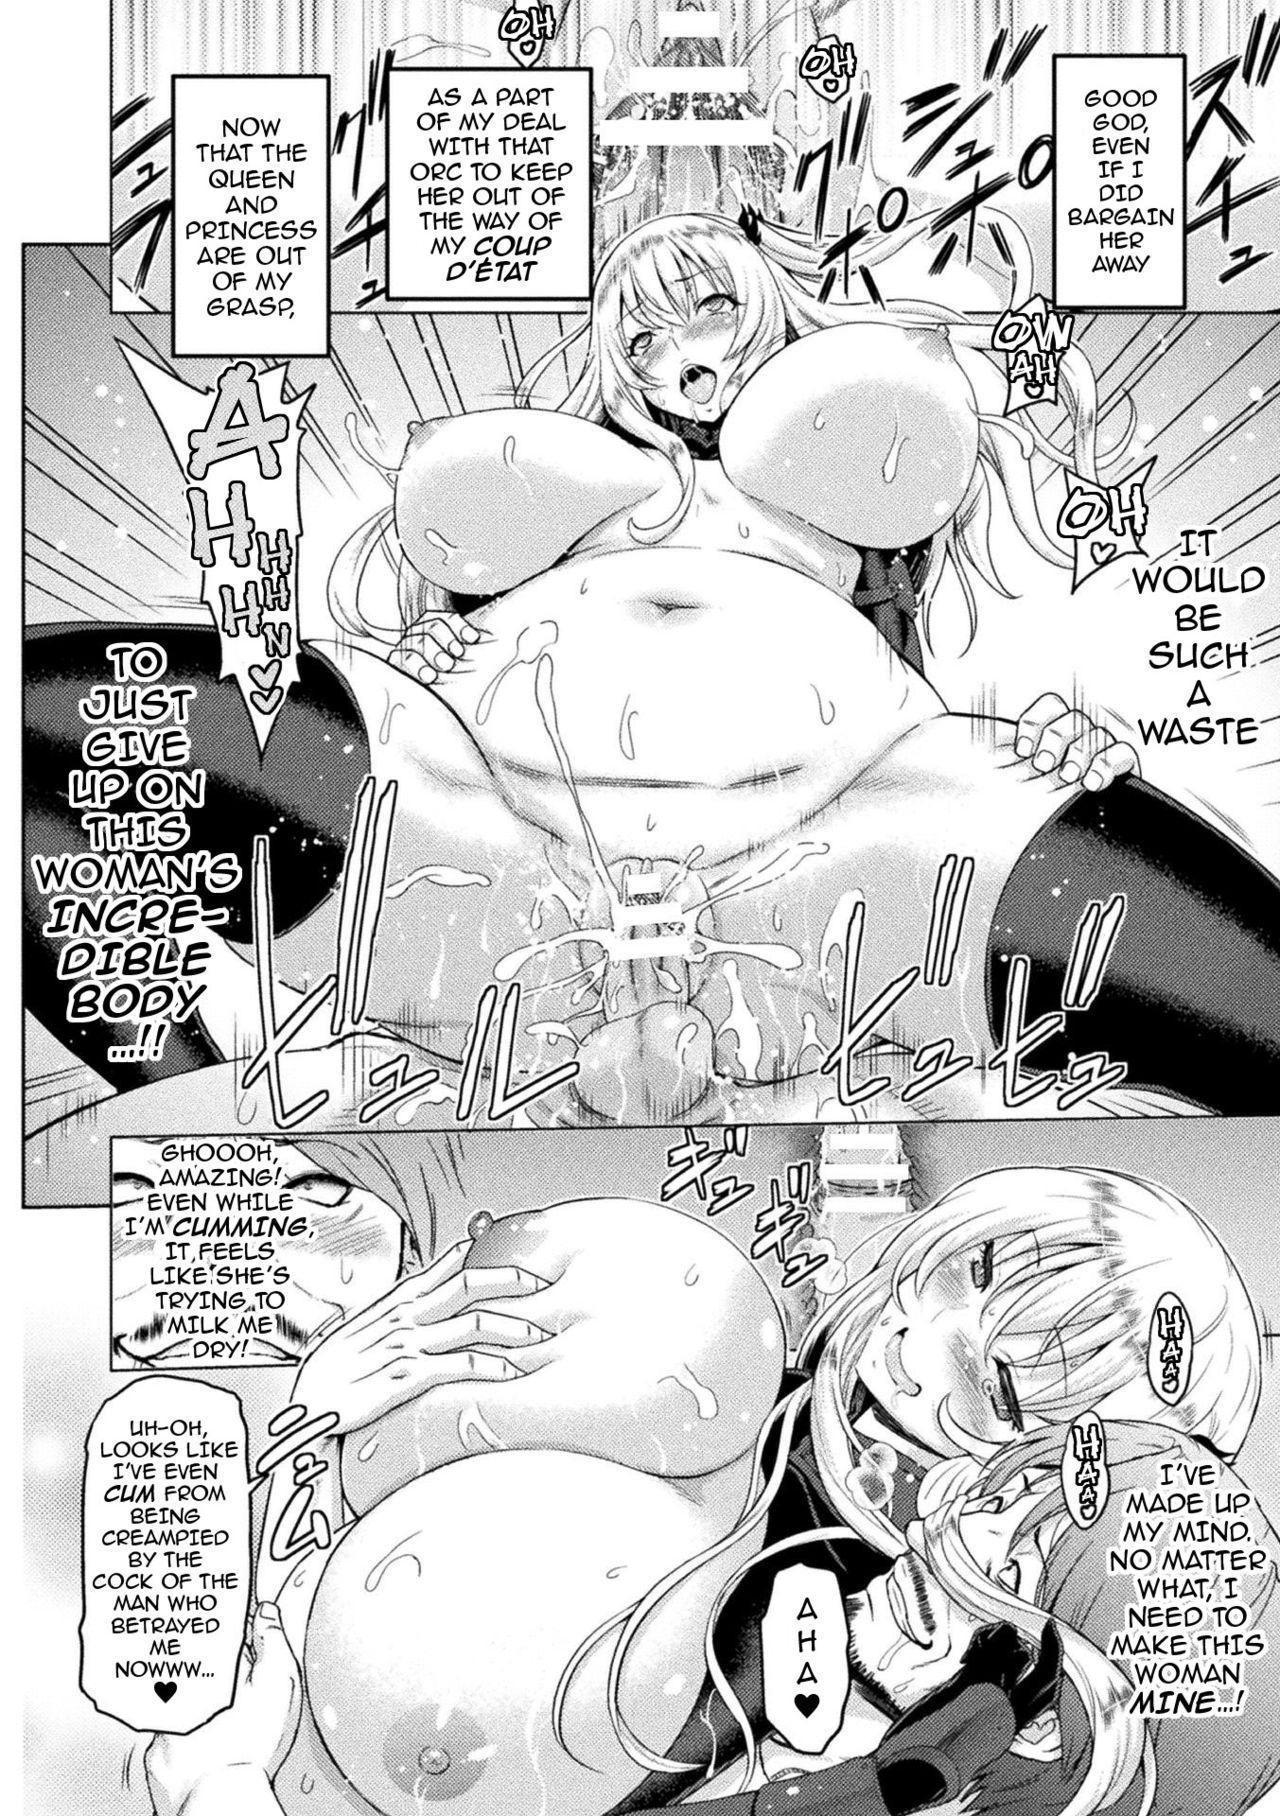 [Yamada Gogogo] Erona ~Orc no Inmon ni Okasareta Onna Kishi no Matsuro~ | Erona ~The Fall of a Beautiful Knight Cursed with the Lewd Mark of an Orc~ [English] {darknight} 88